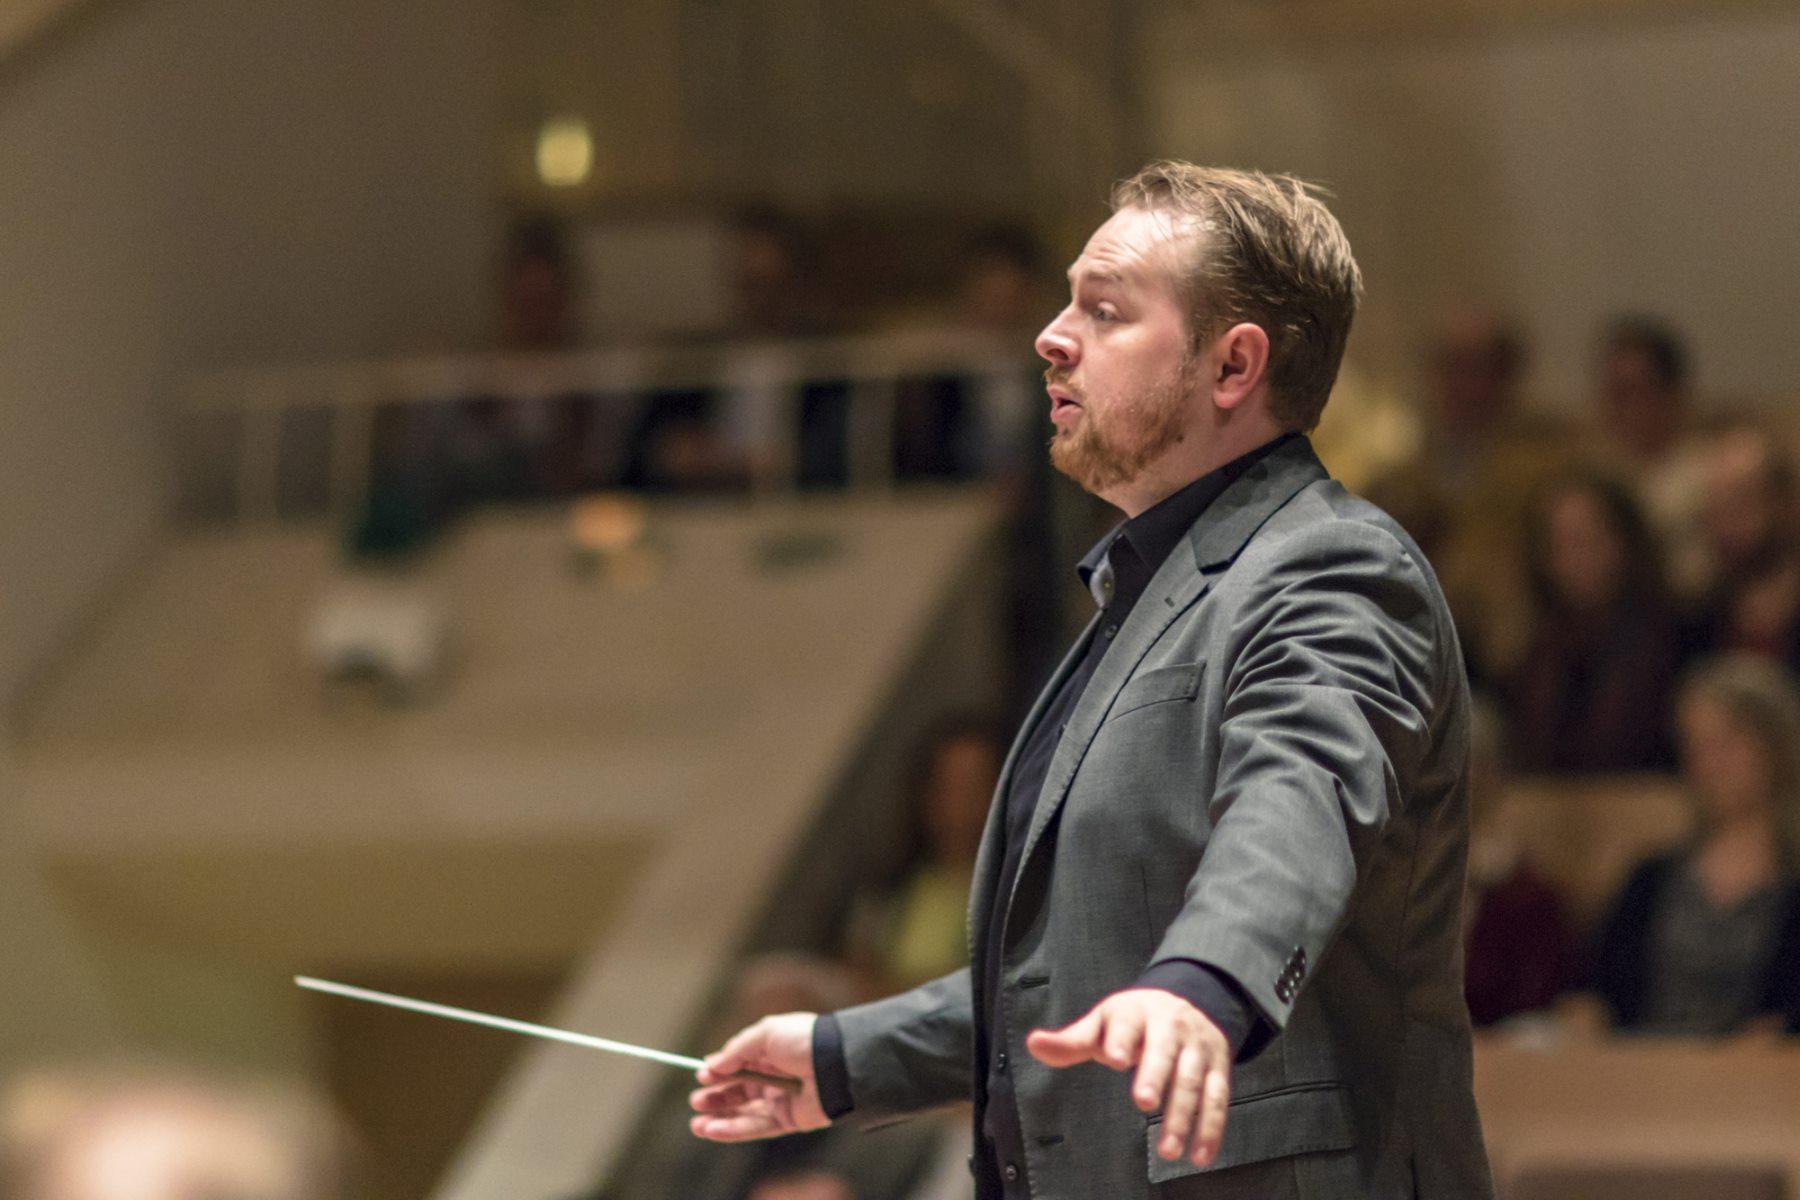 Dirigent Niklas Schluckebier leitet die Zentralkapelle Berlin in der Berliner Philharmonie